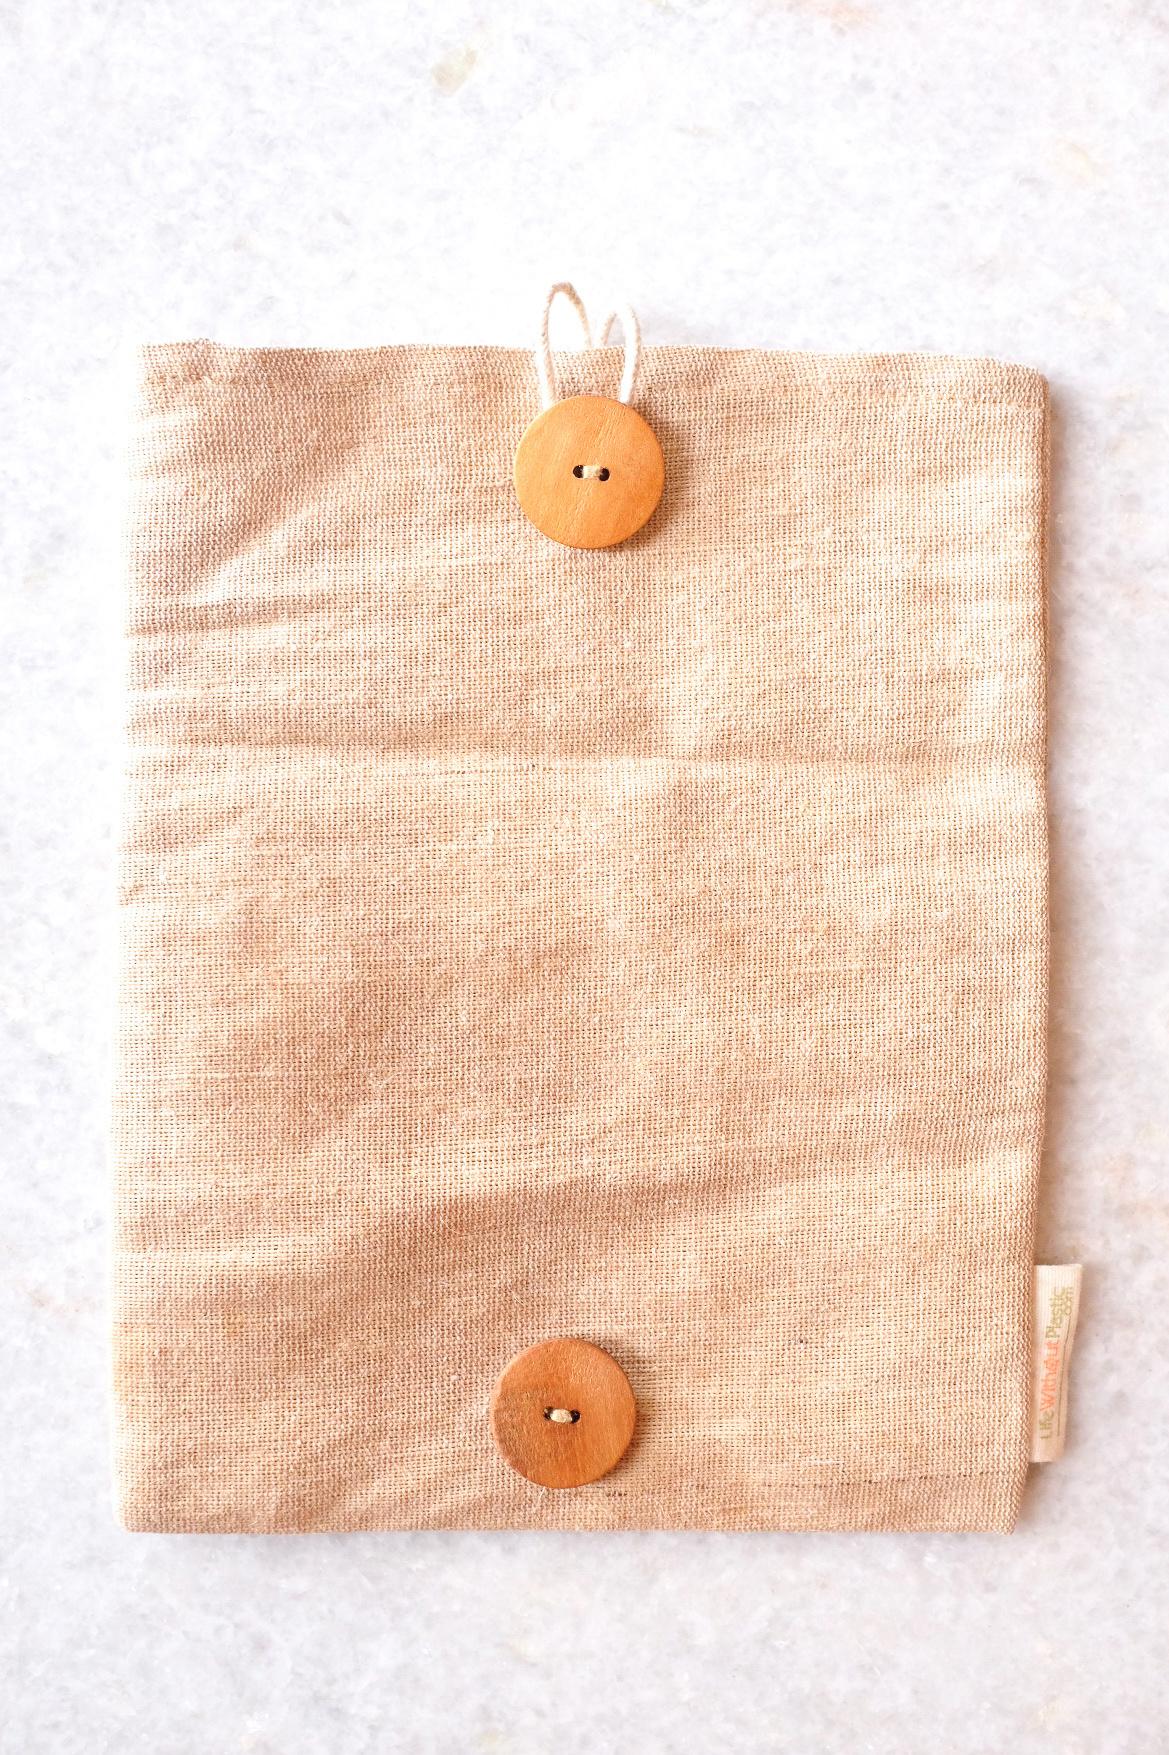 Adjustable Reusable Juco Sandwich Bag